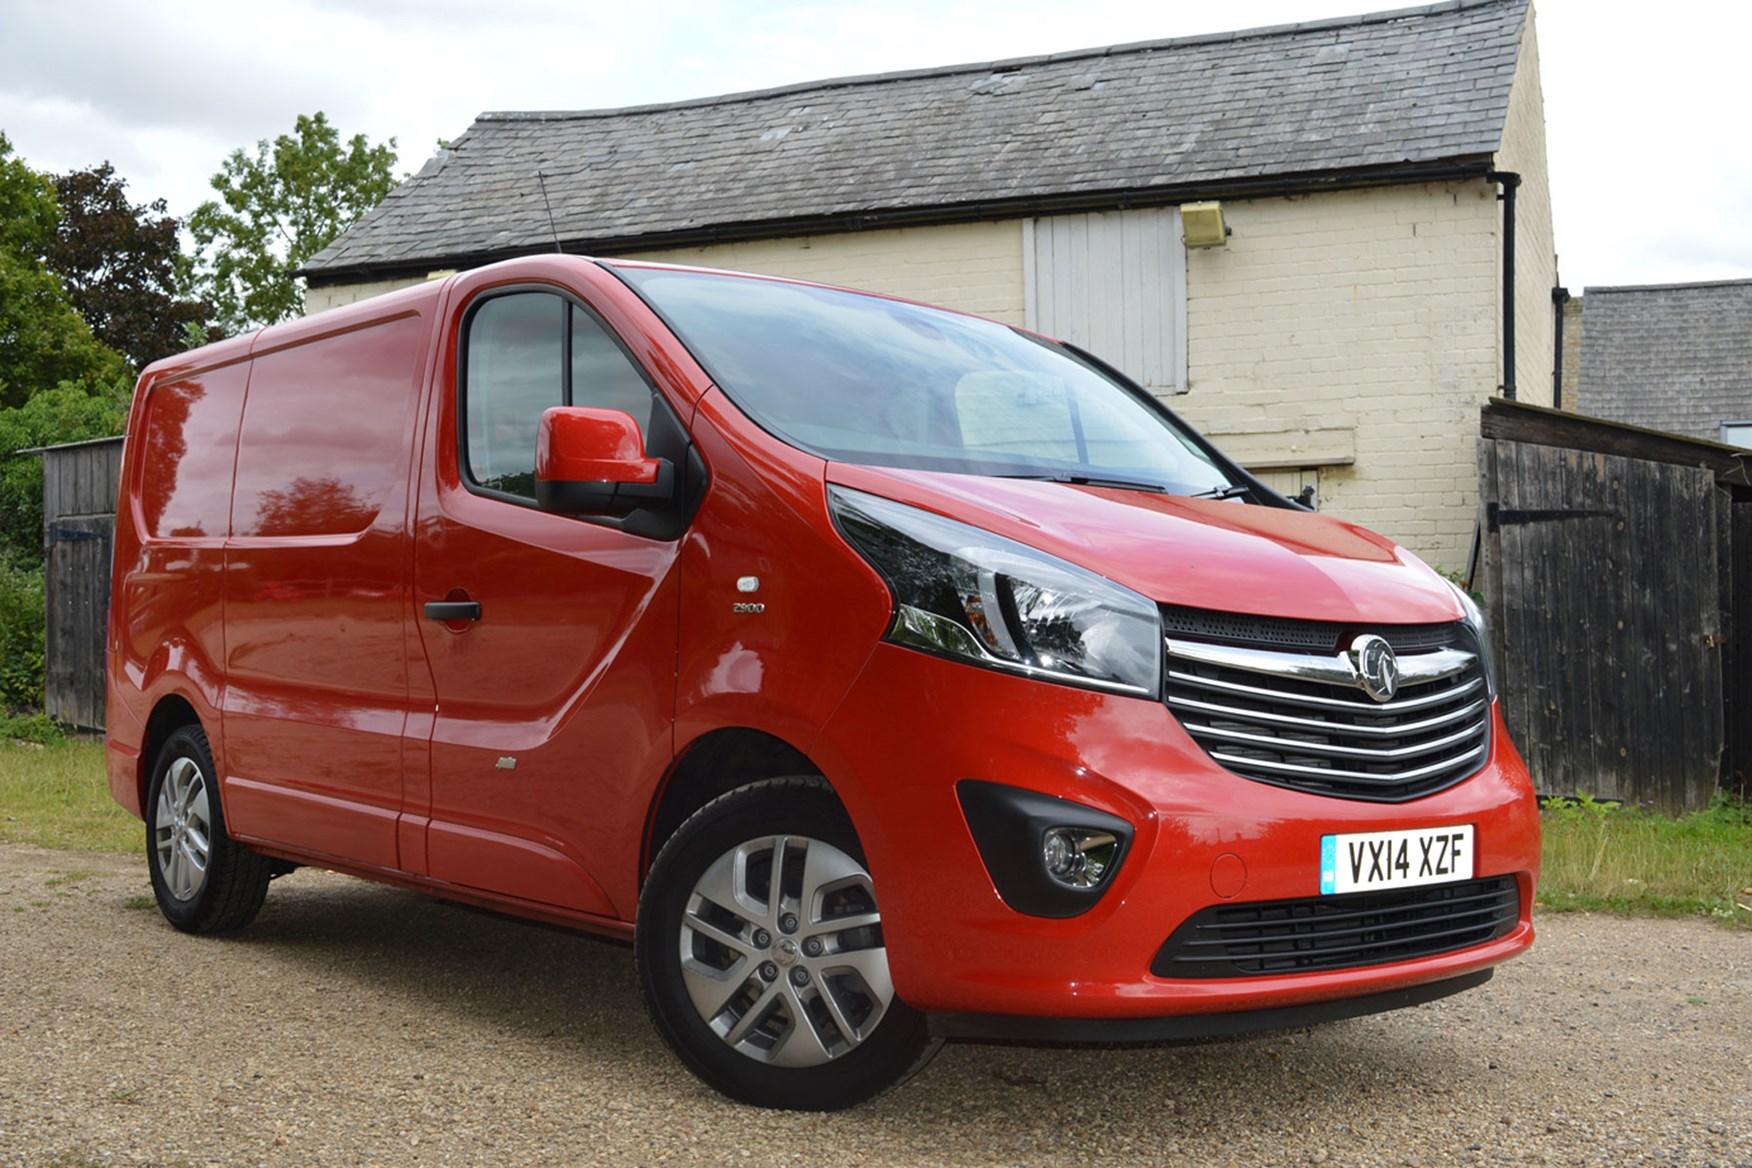 Vauxhall Vivaro Sportive EU5 review - front view, red